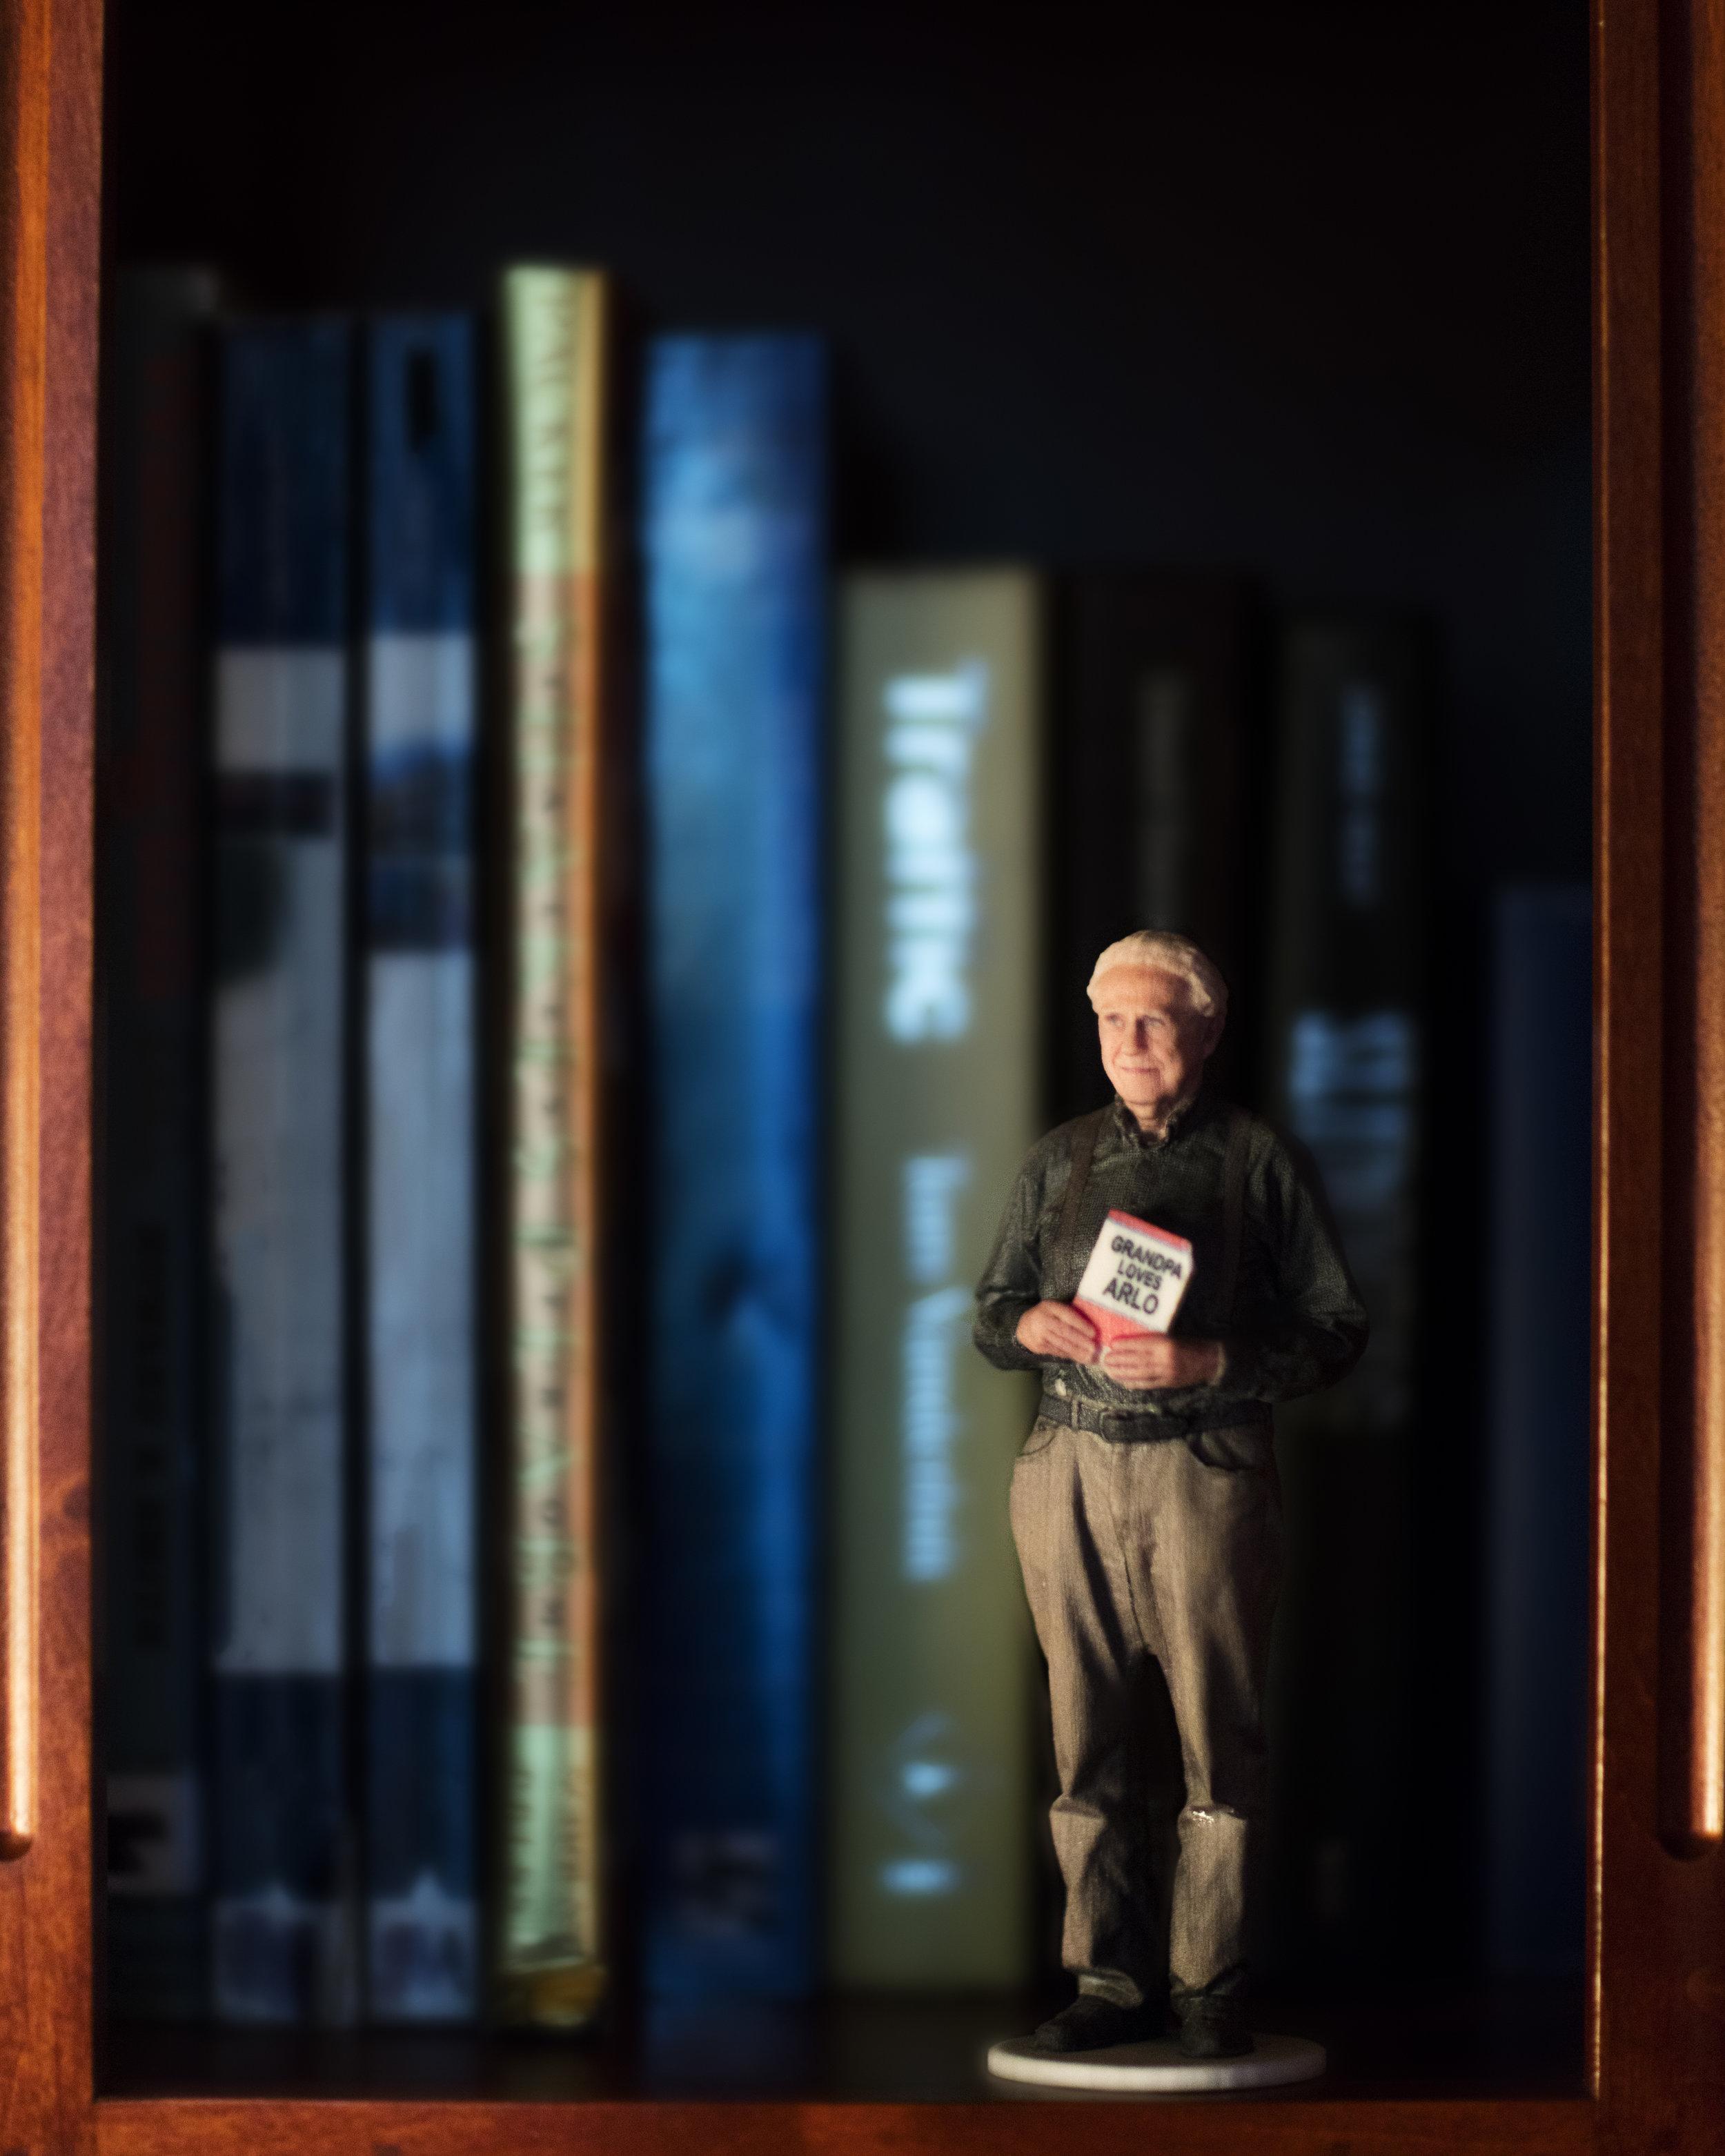 Grandpa on the bookshelf